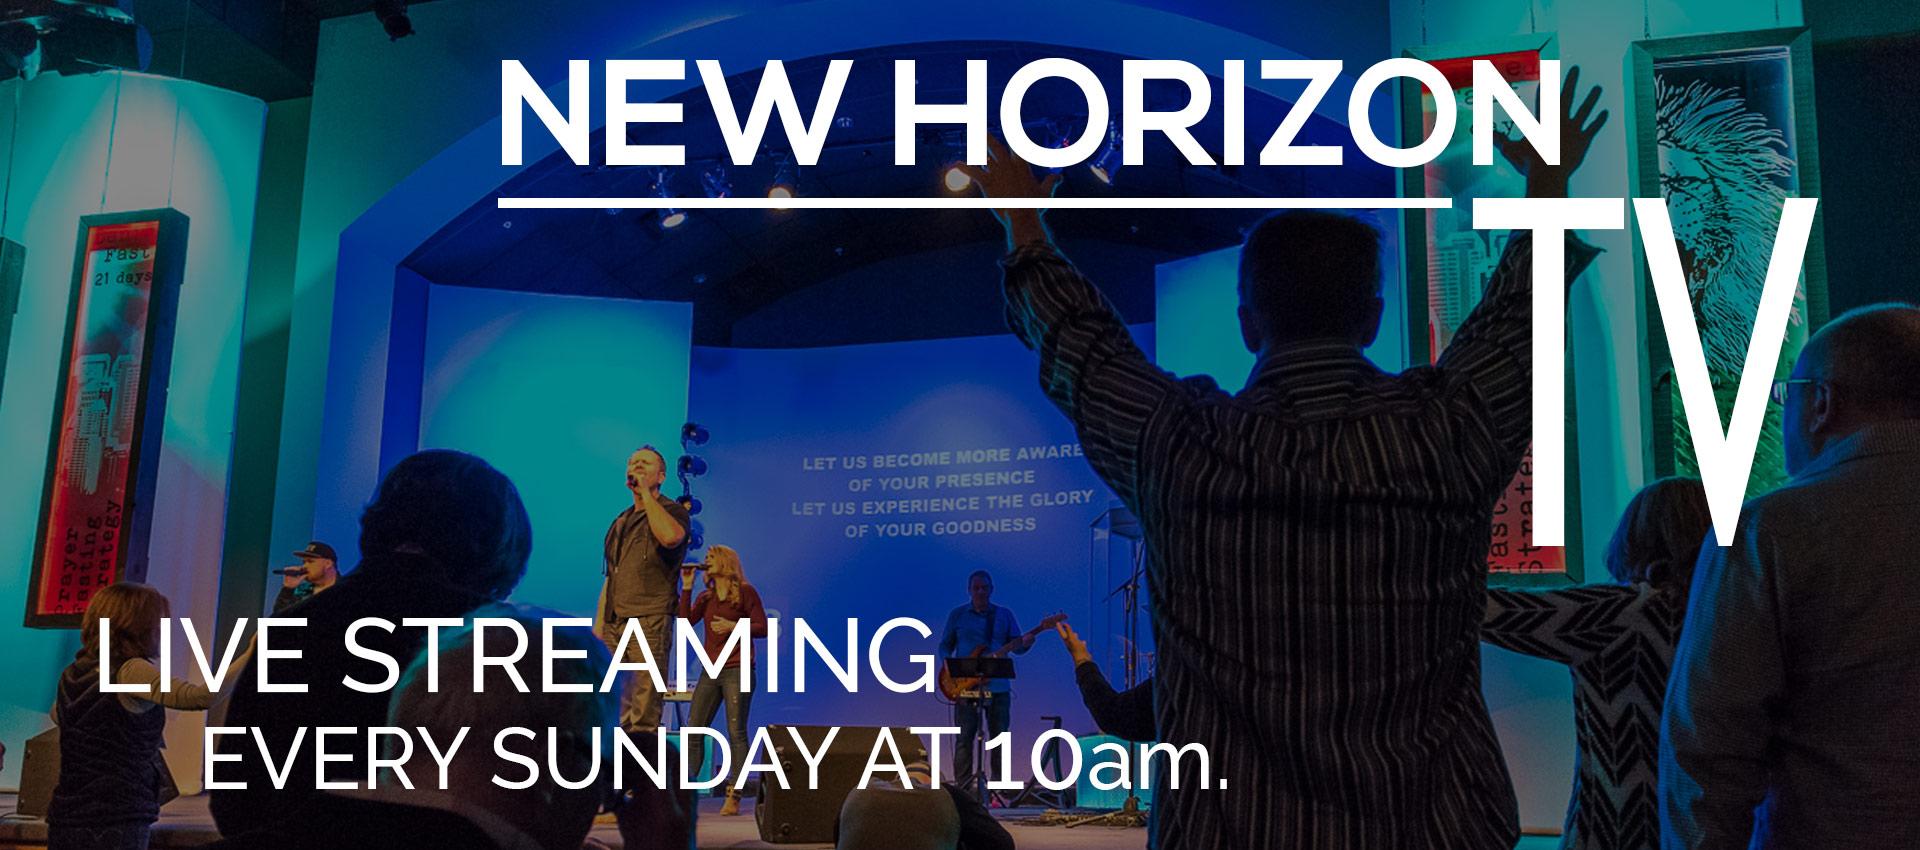 New Horizon Live Streaming